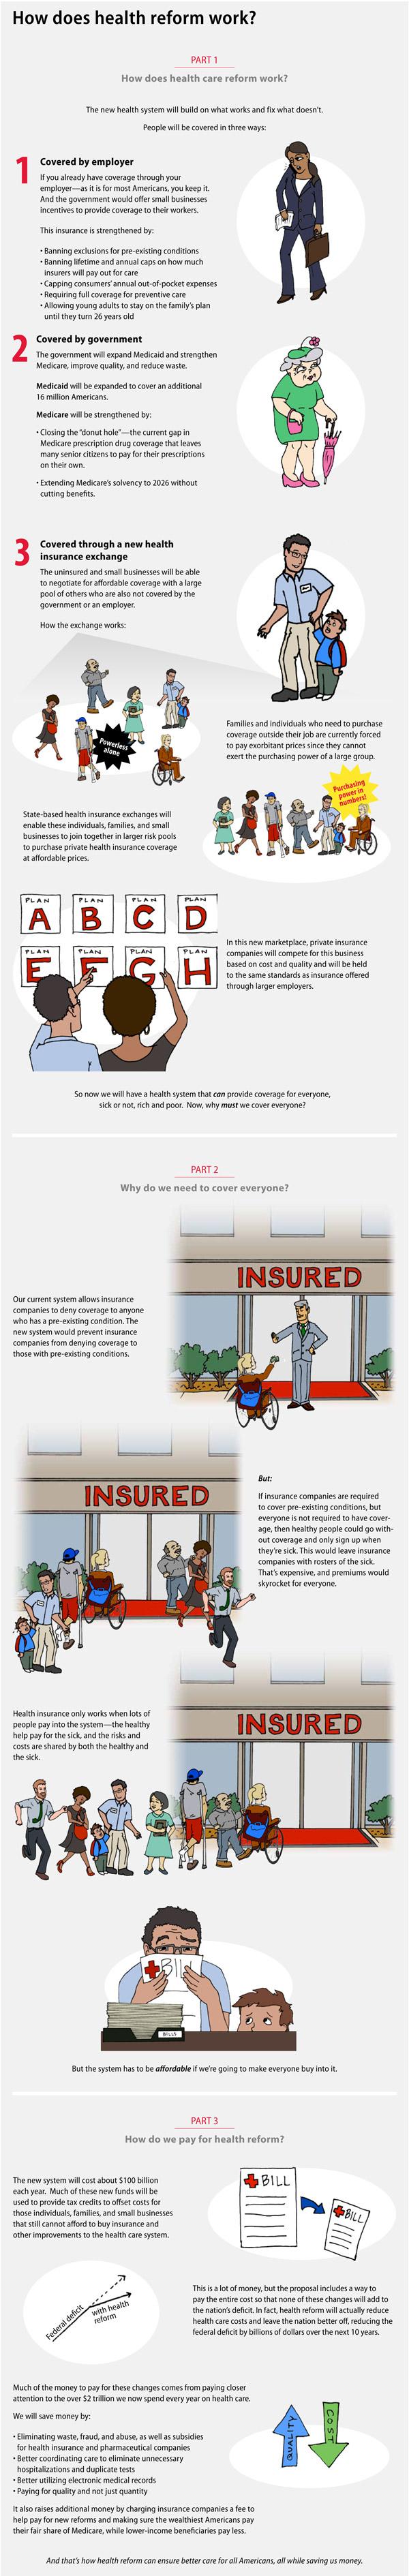 health care reform, health reform, infographic @zanebenefits